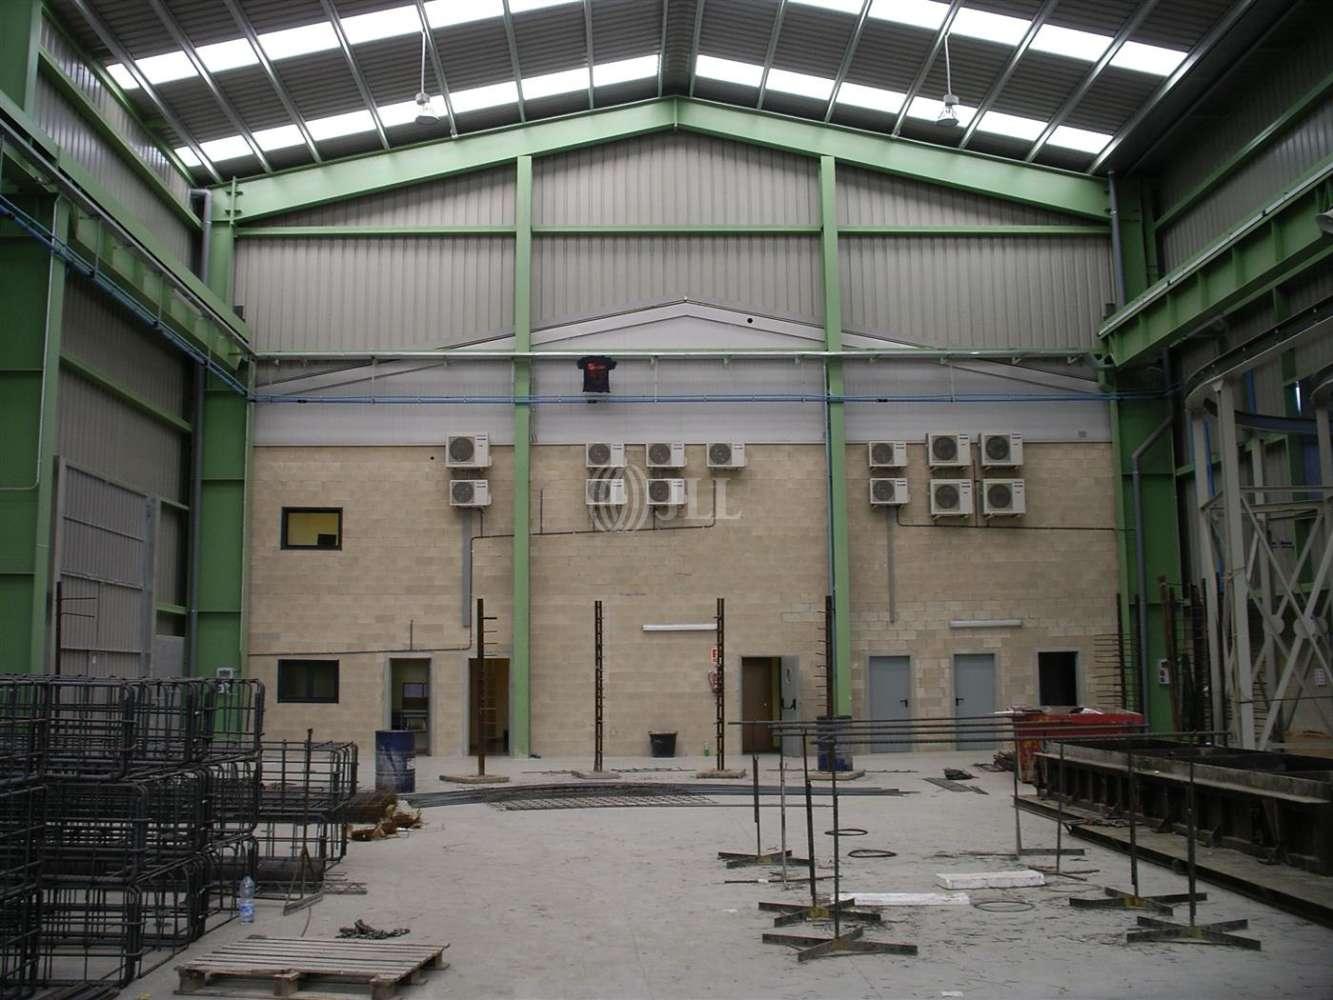 Naves industriales y logísticas Tortosa, 43500 - Nave Industrial - B0511 NAVE EN VENTA TORTOSA-CATALUNYA SUD - 23205